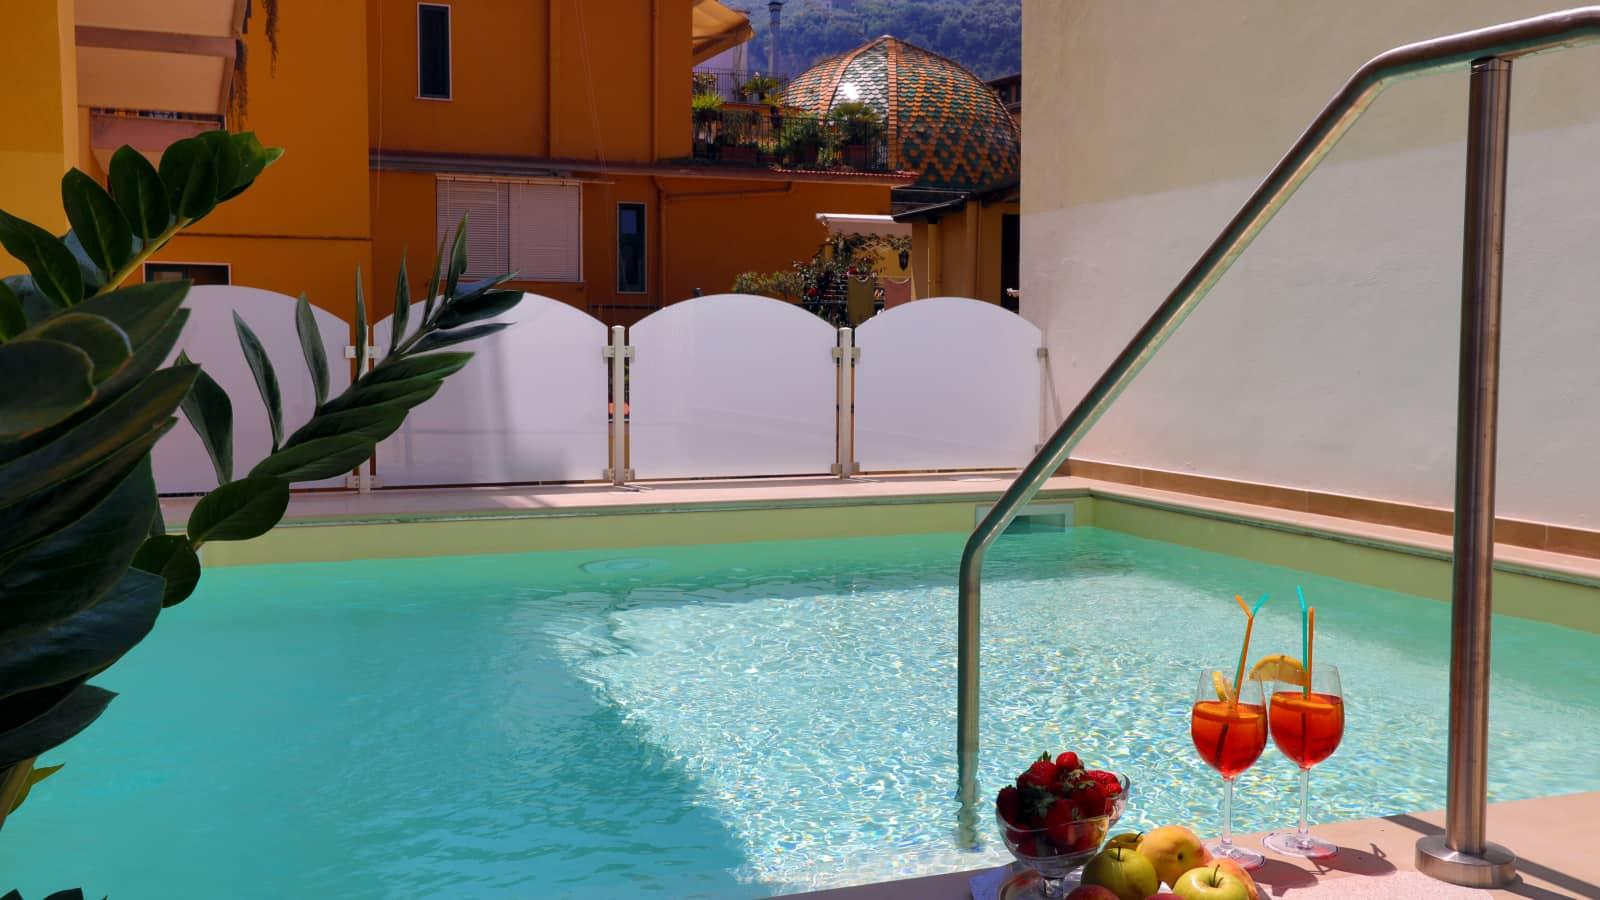 Hotel Astoria Sorrento Tripadvisor